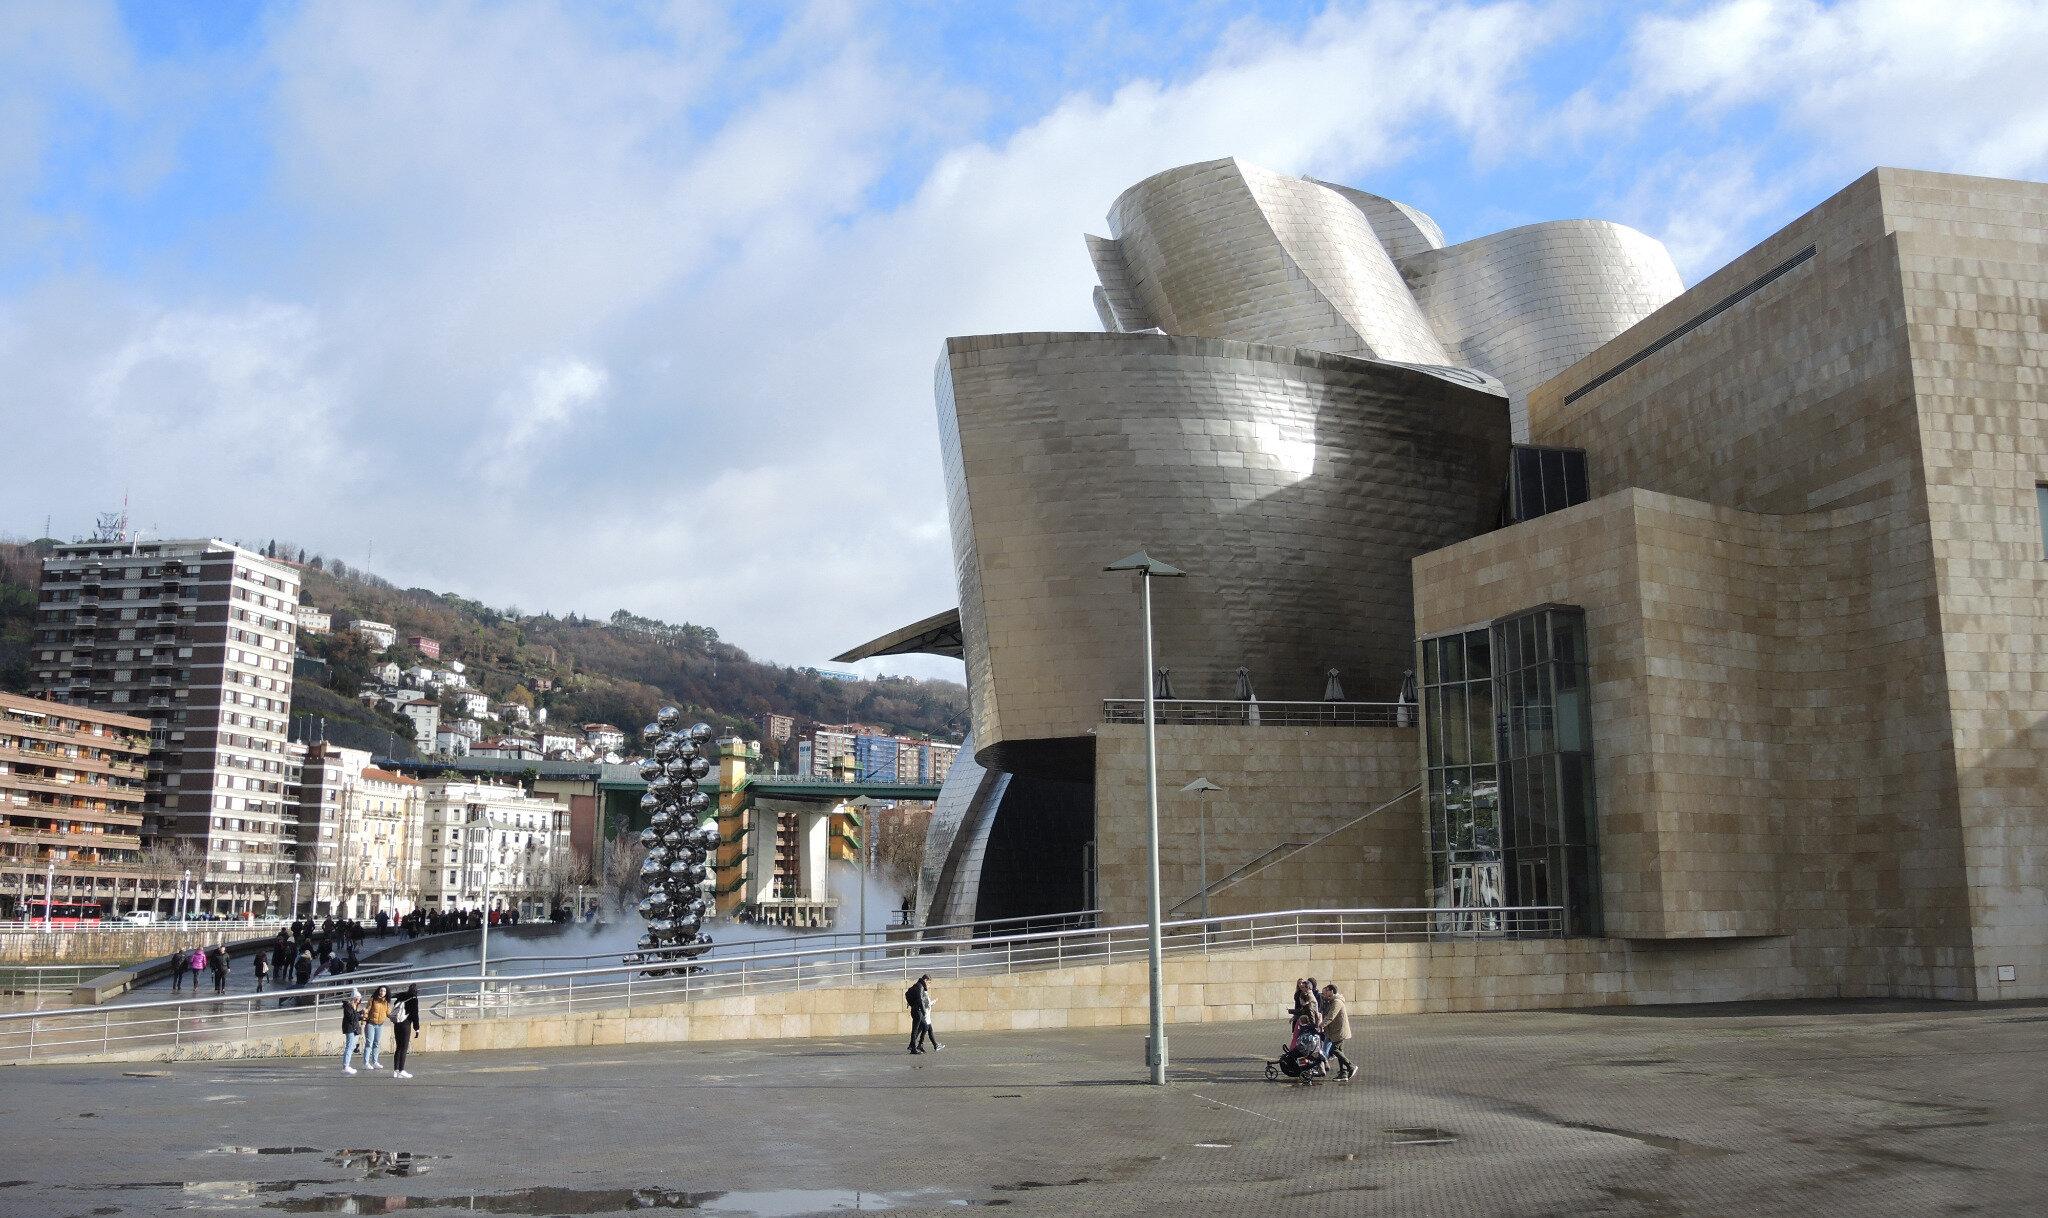 Bilbao, musée Guggenheim et Grand arbre et l'oeil